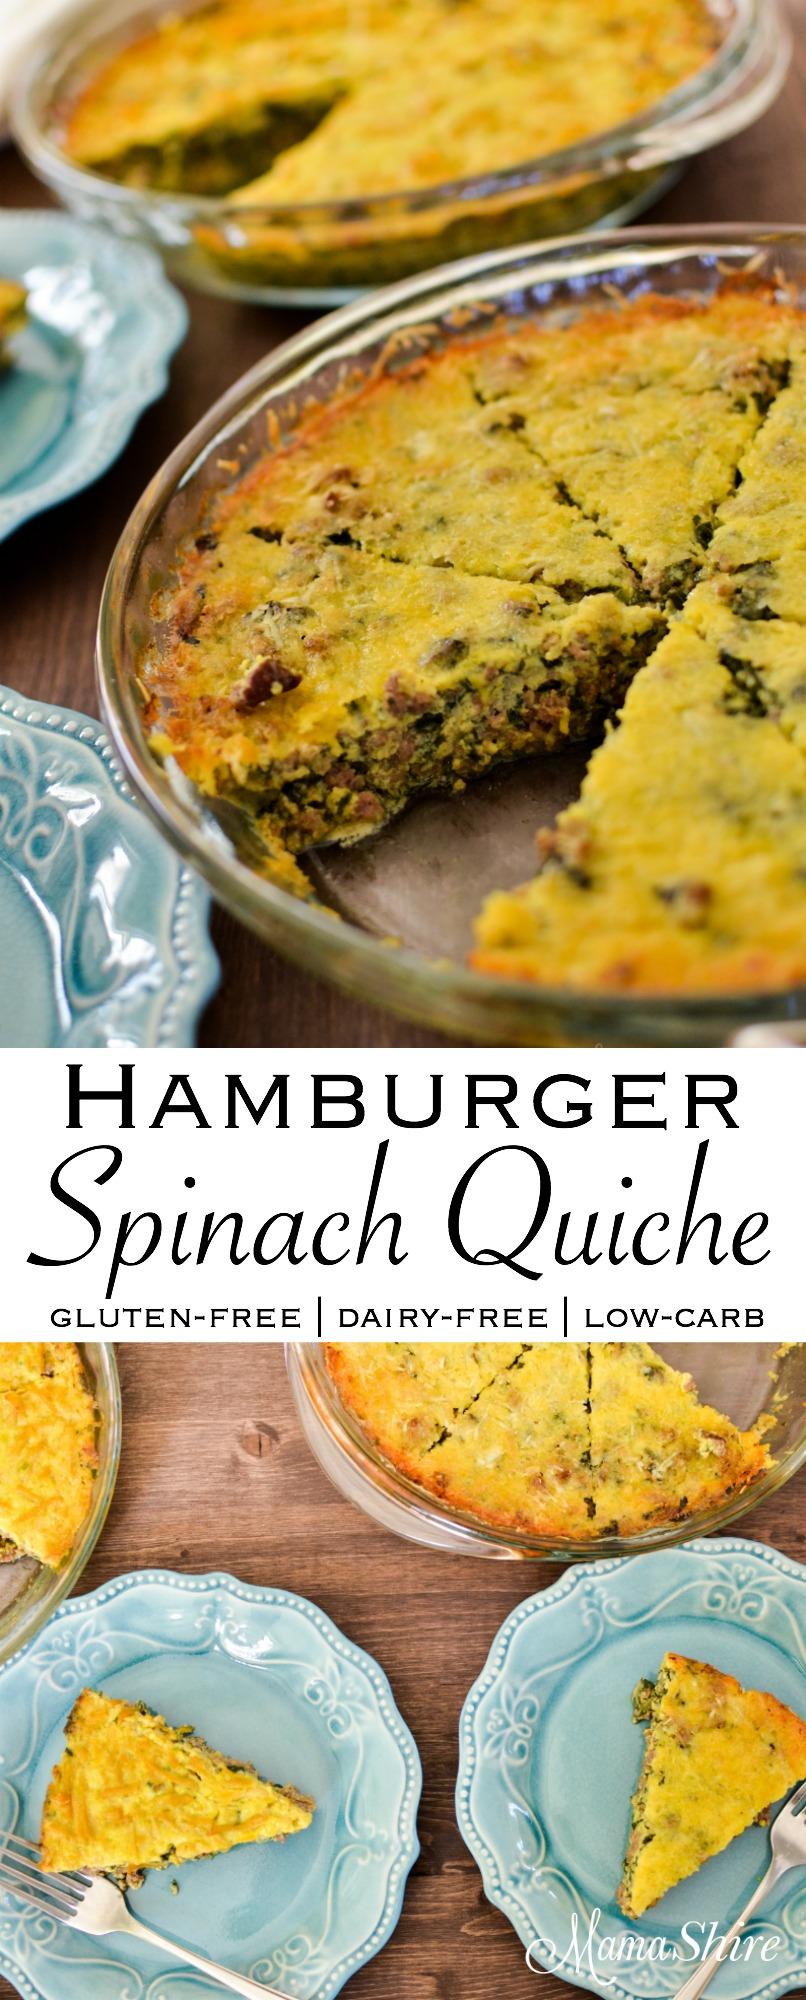 Hamburger Spinach Quiche Gluten-free, Dairy-free, Low Carb, THM-S